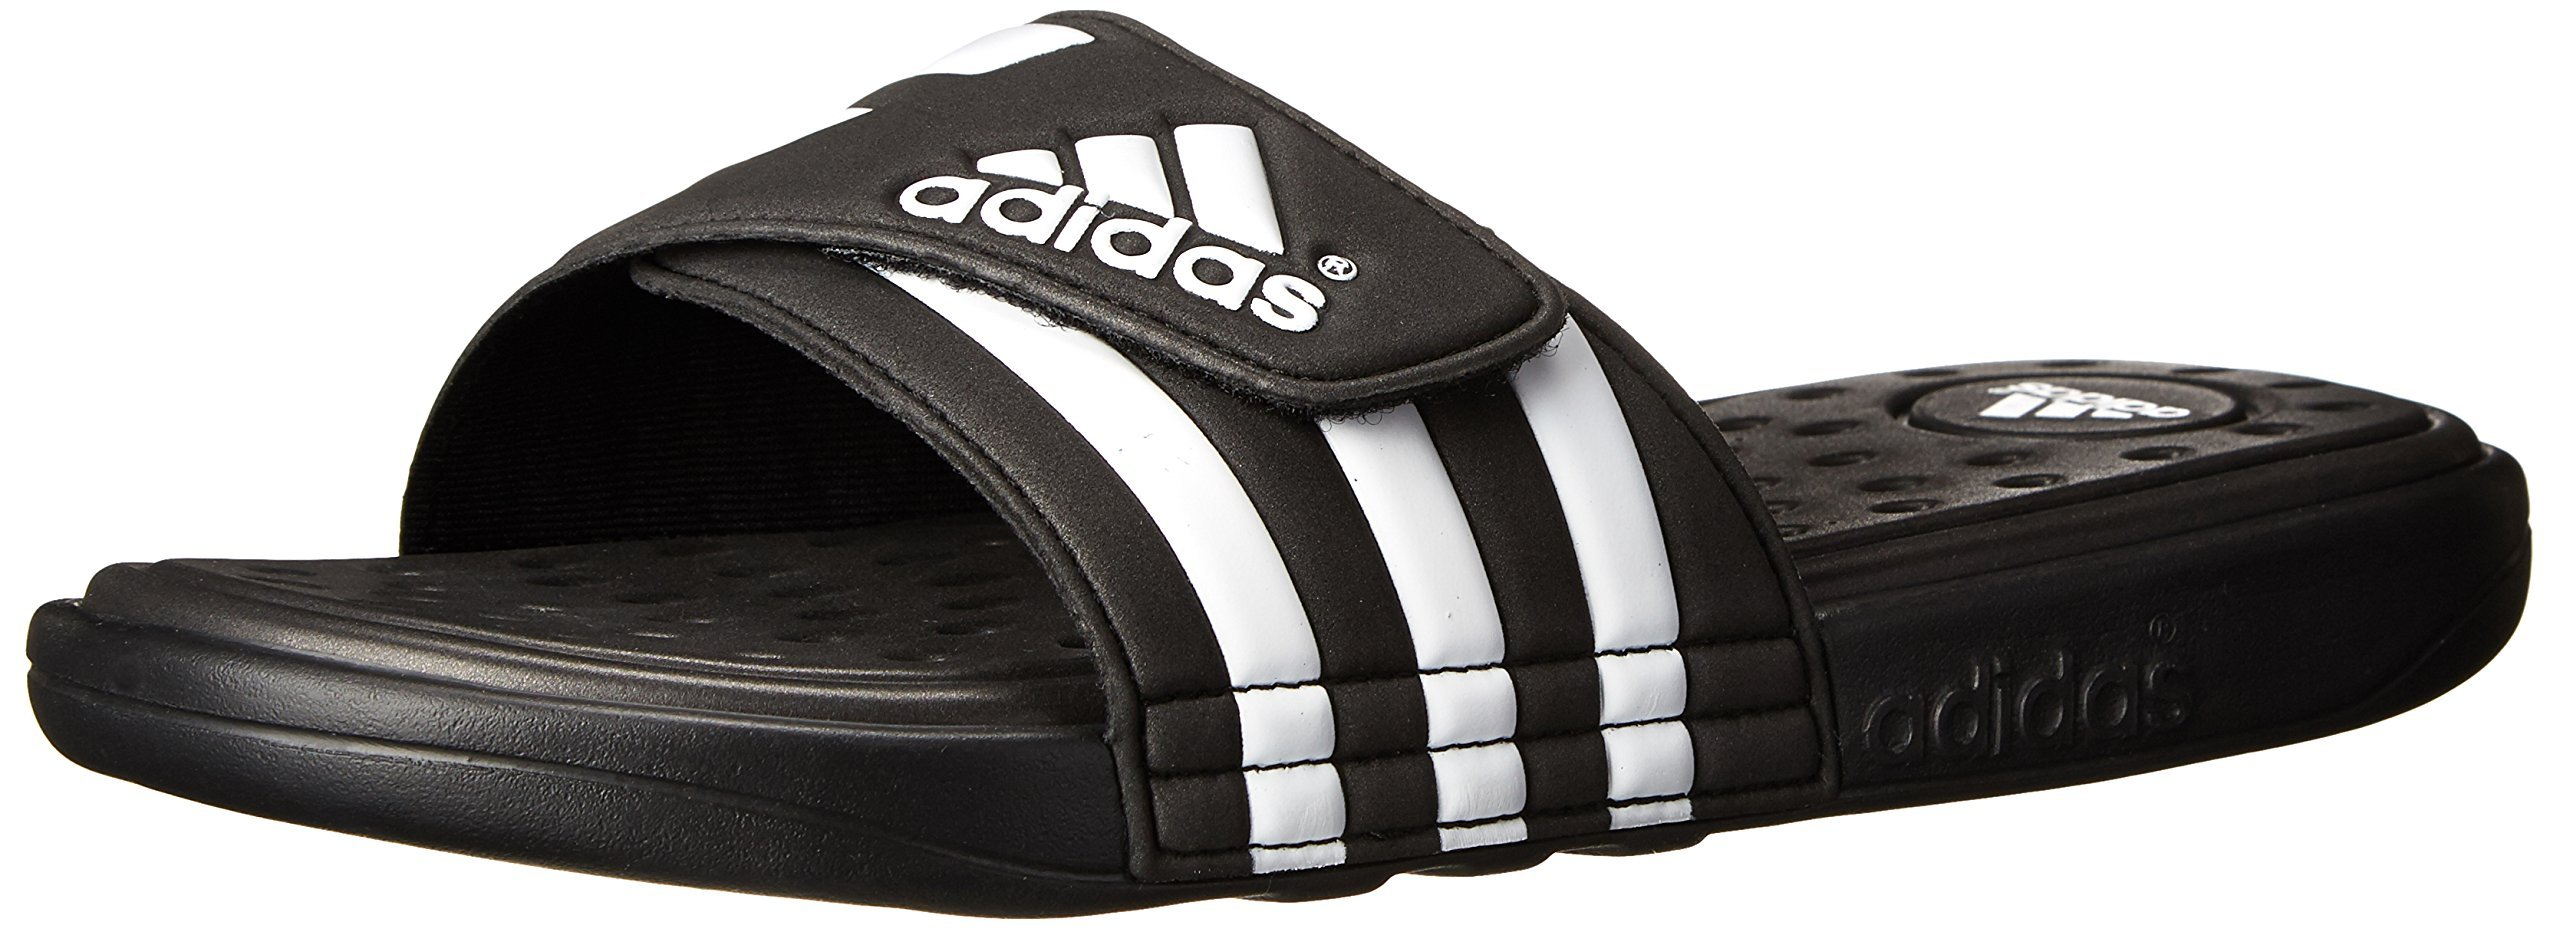 adidas Performance Men's adissage SC Sandal,Black/White/Black,10 M US